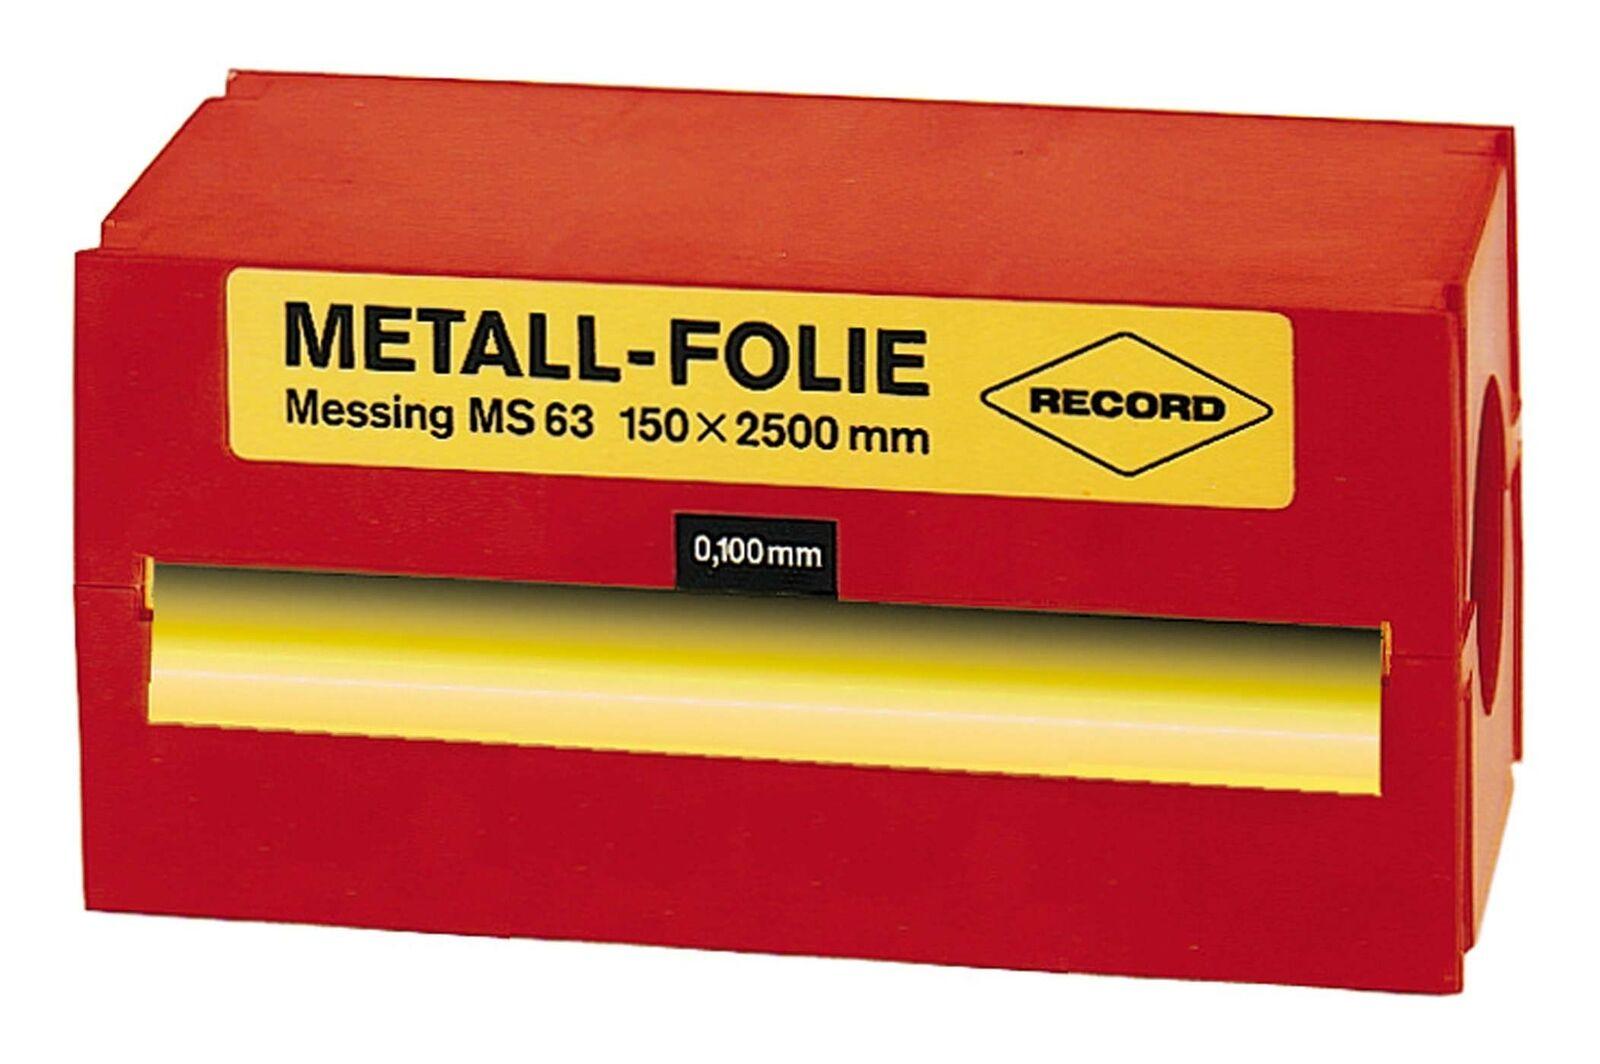 Record Metallfolie Stahl rostfrei 150 x 2500 x 0,500mm - SN0,500